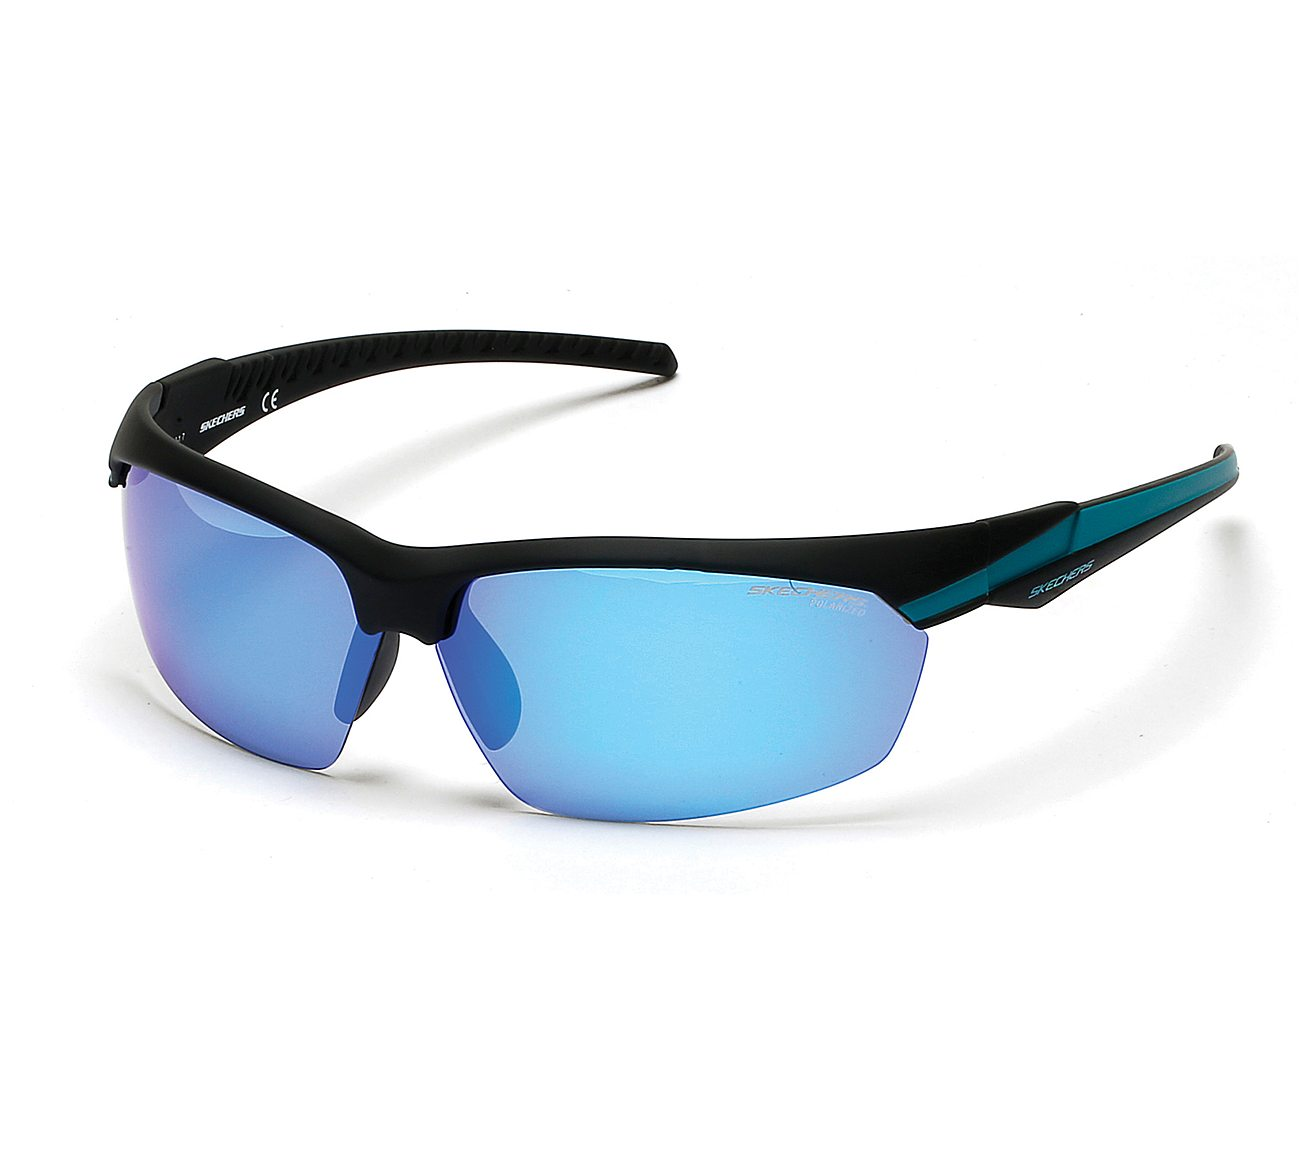 ecf2b32f0f0a Buy SKECHERS Sport Wrap Half Rim Sunglasses Accessories Shoes only ...